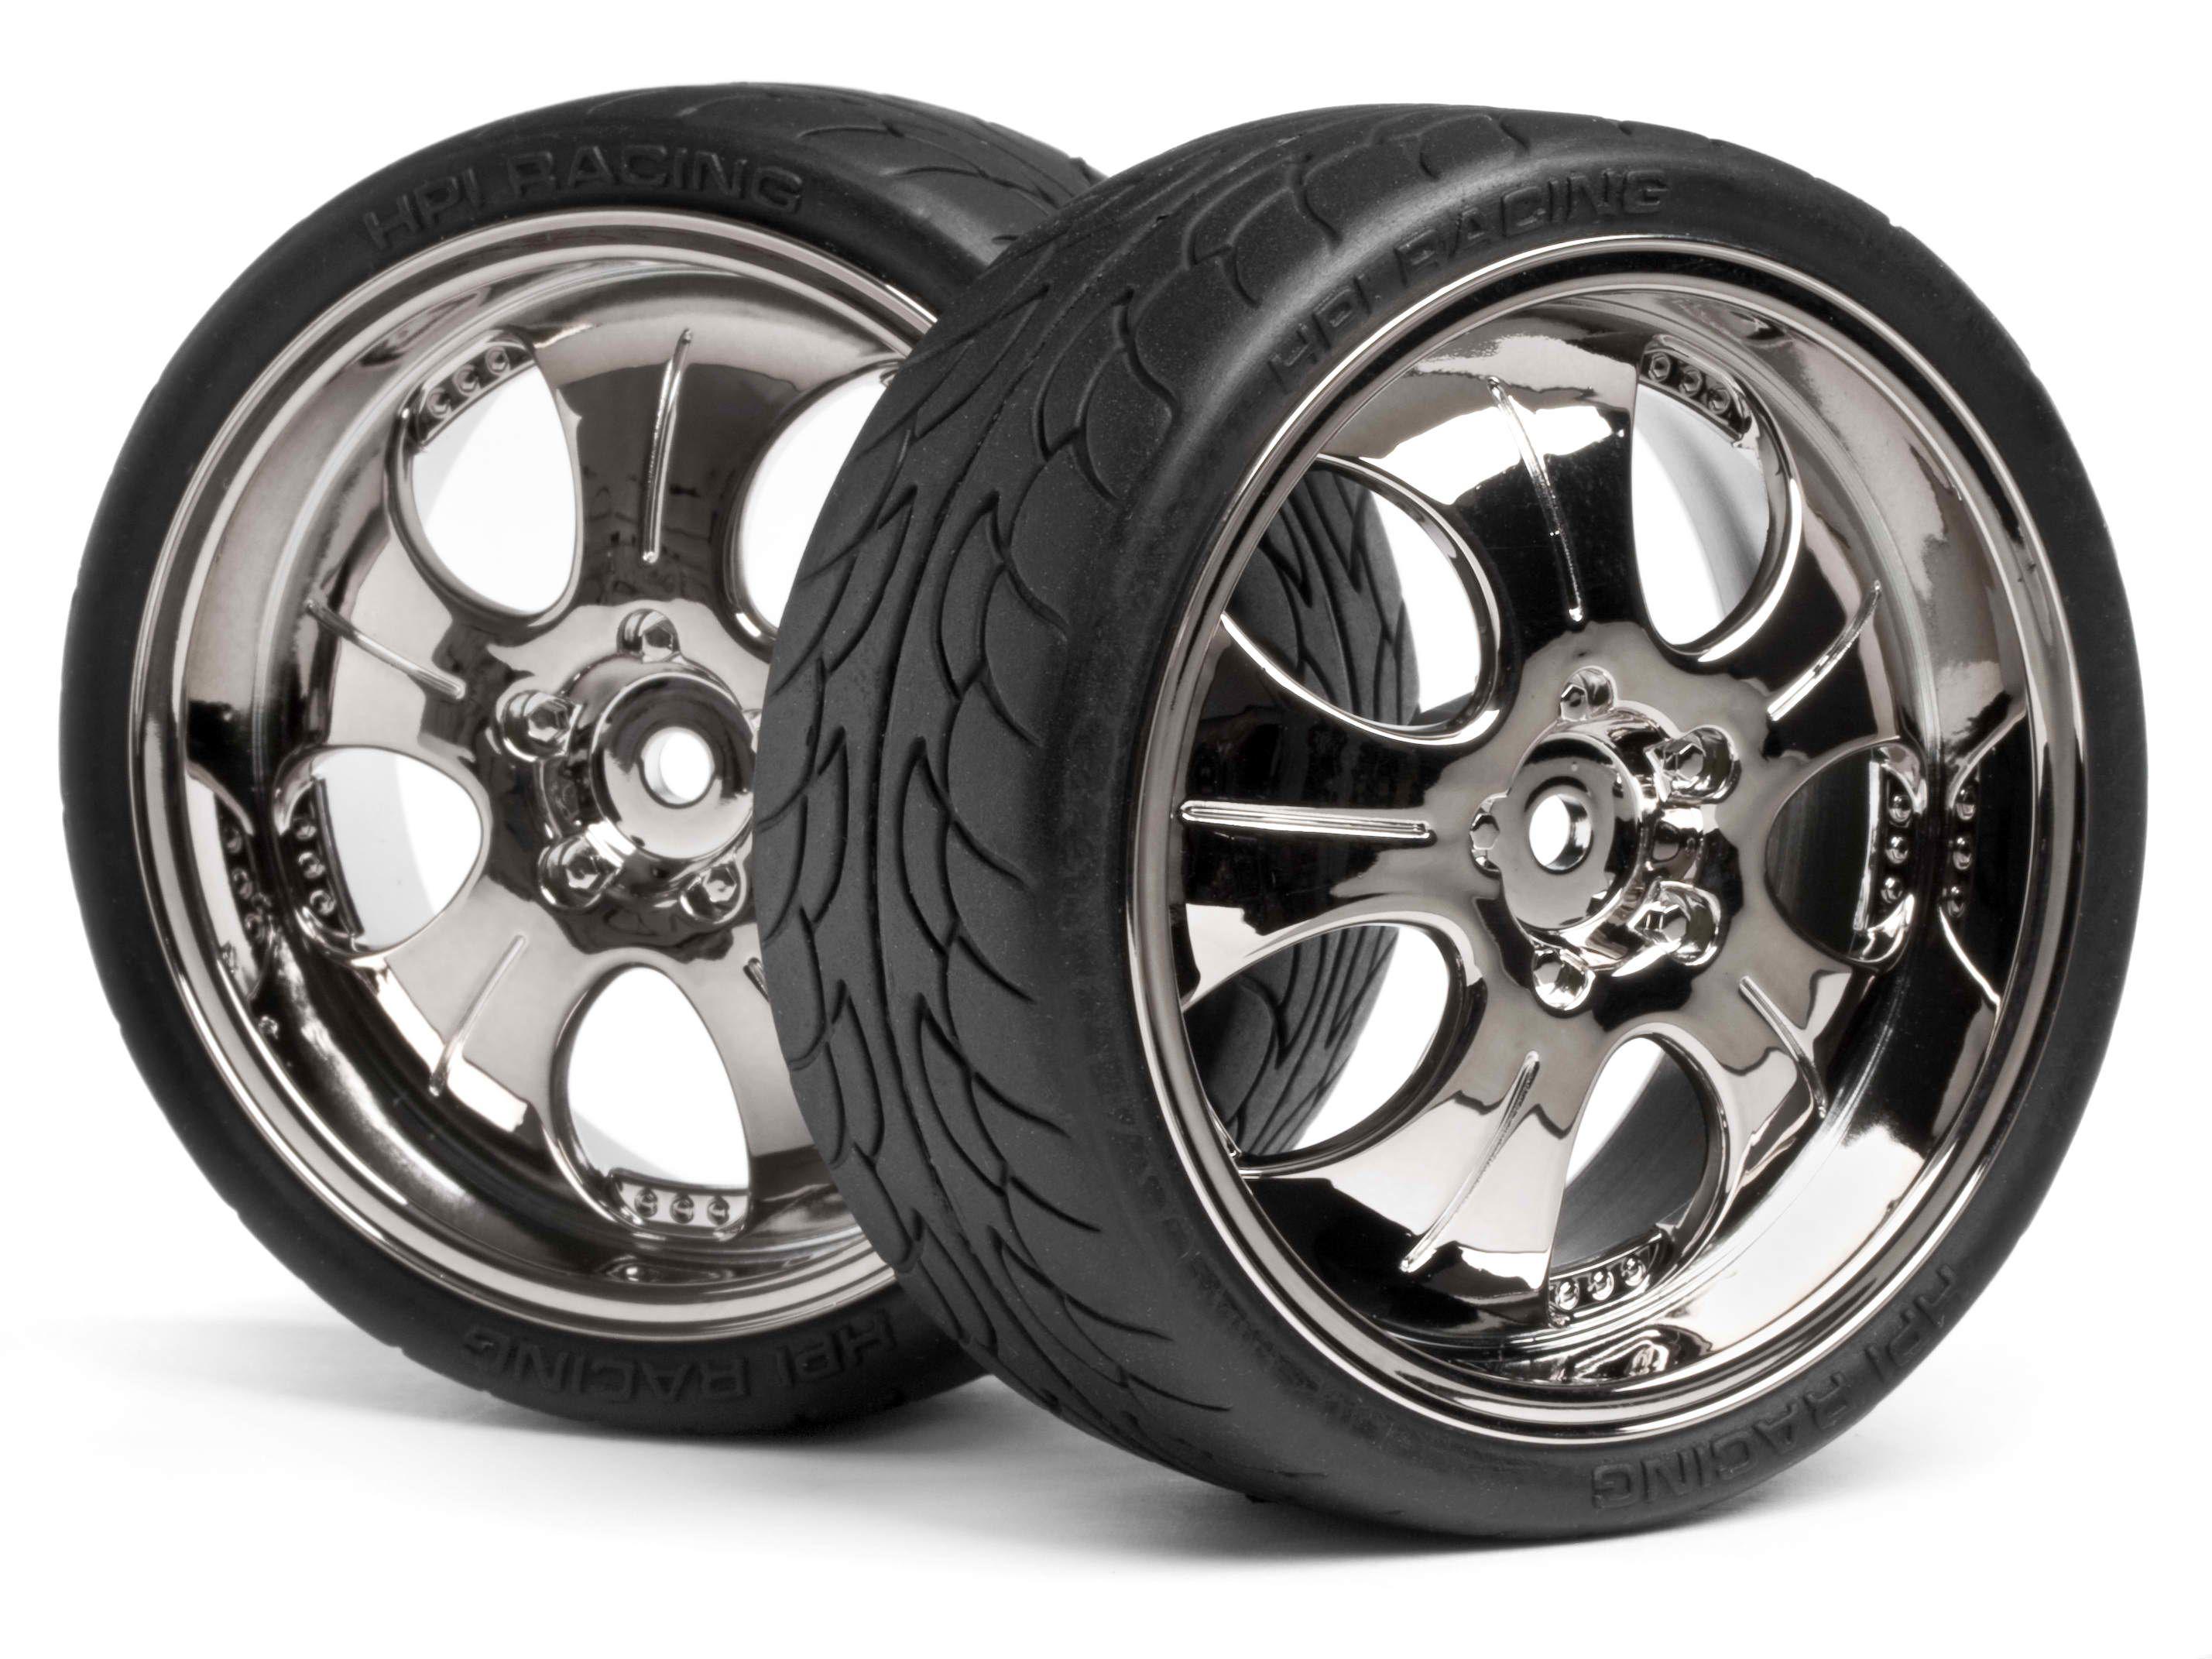 trailers trucks home s wheels mount garage login tire storage on racks for rack tirerackwholesale coupon